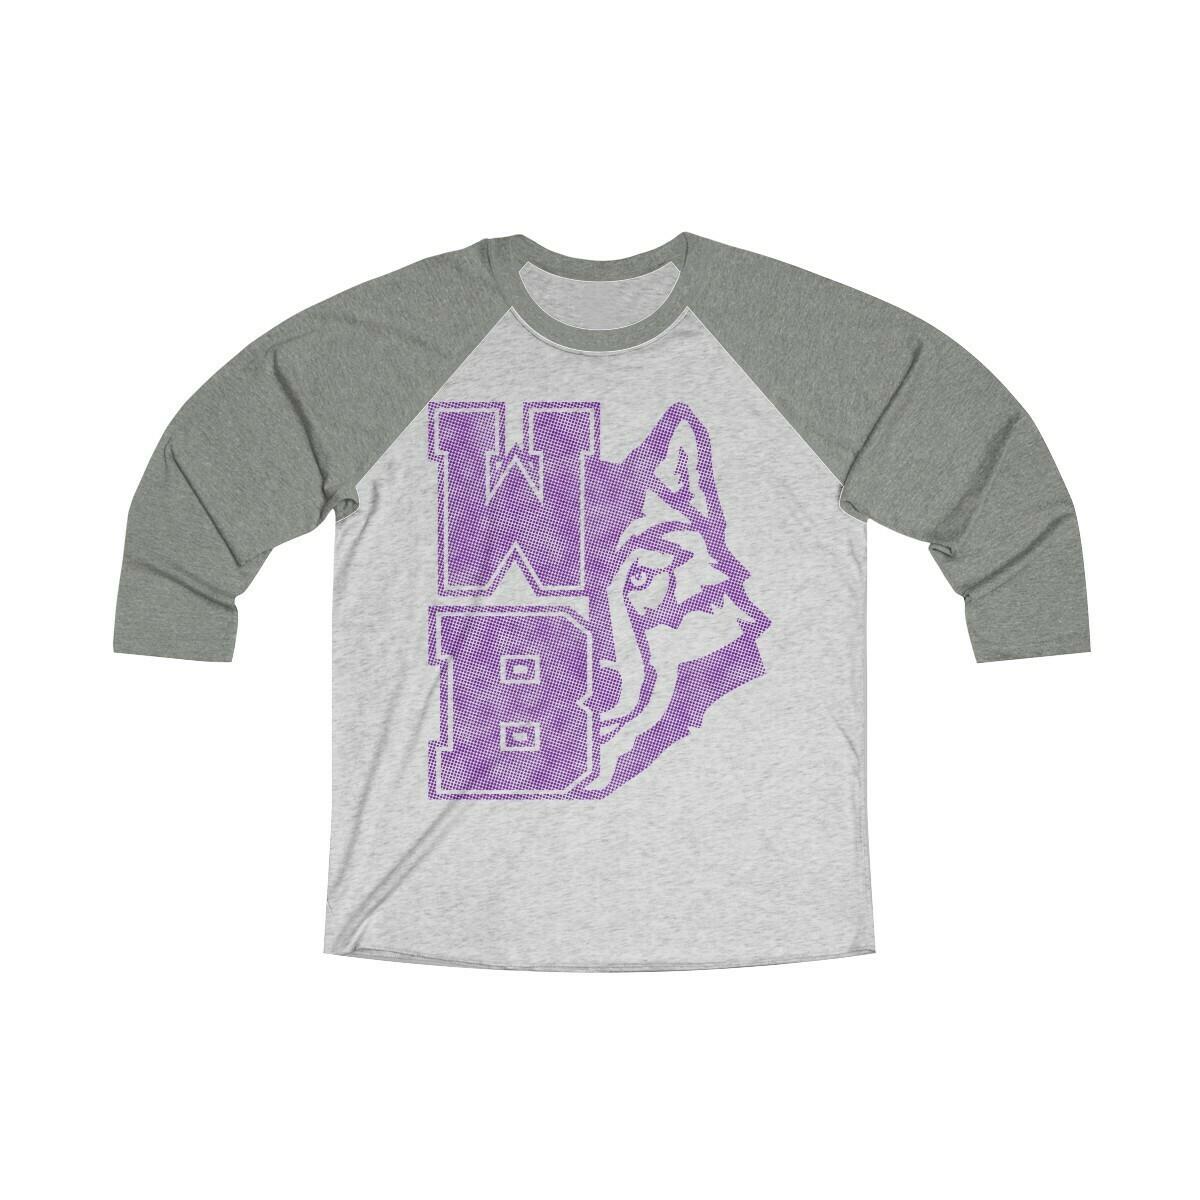 *WB Wolf (P) -Unisex - 3/4 Sleeve Raglan Shirt - Next Level 6051